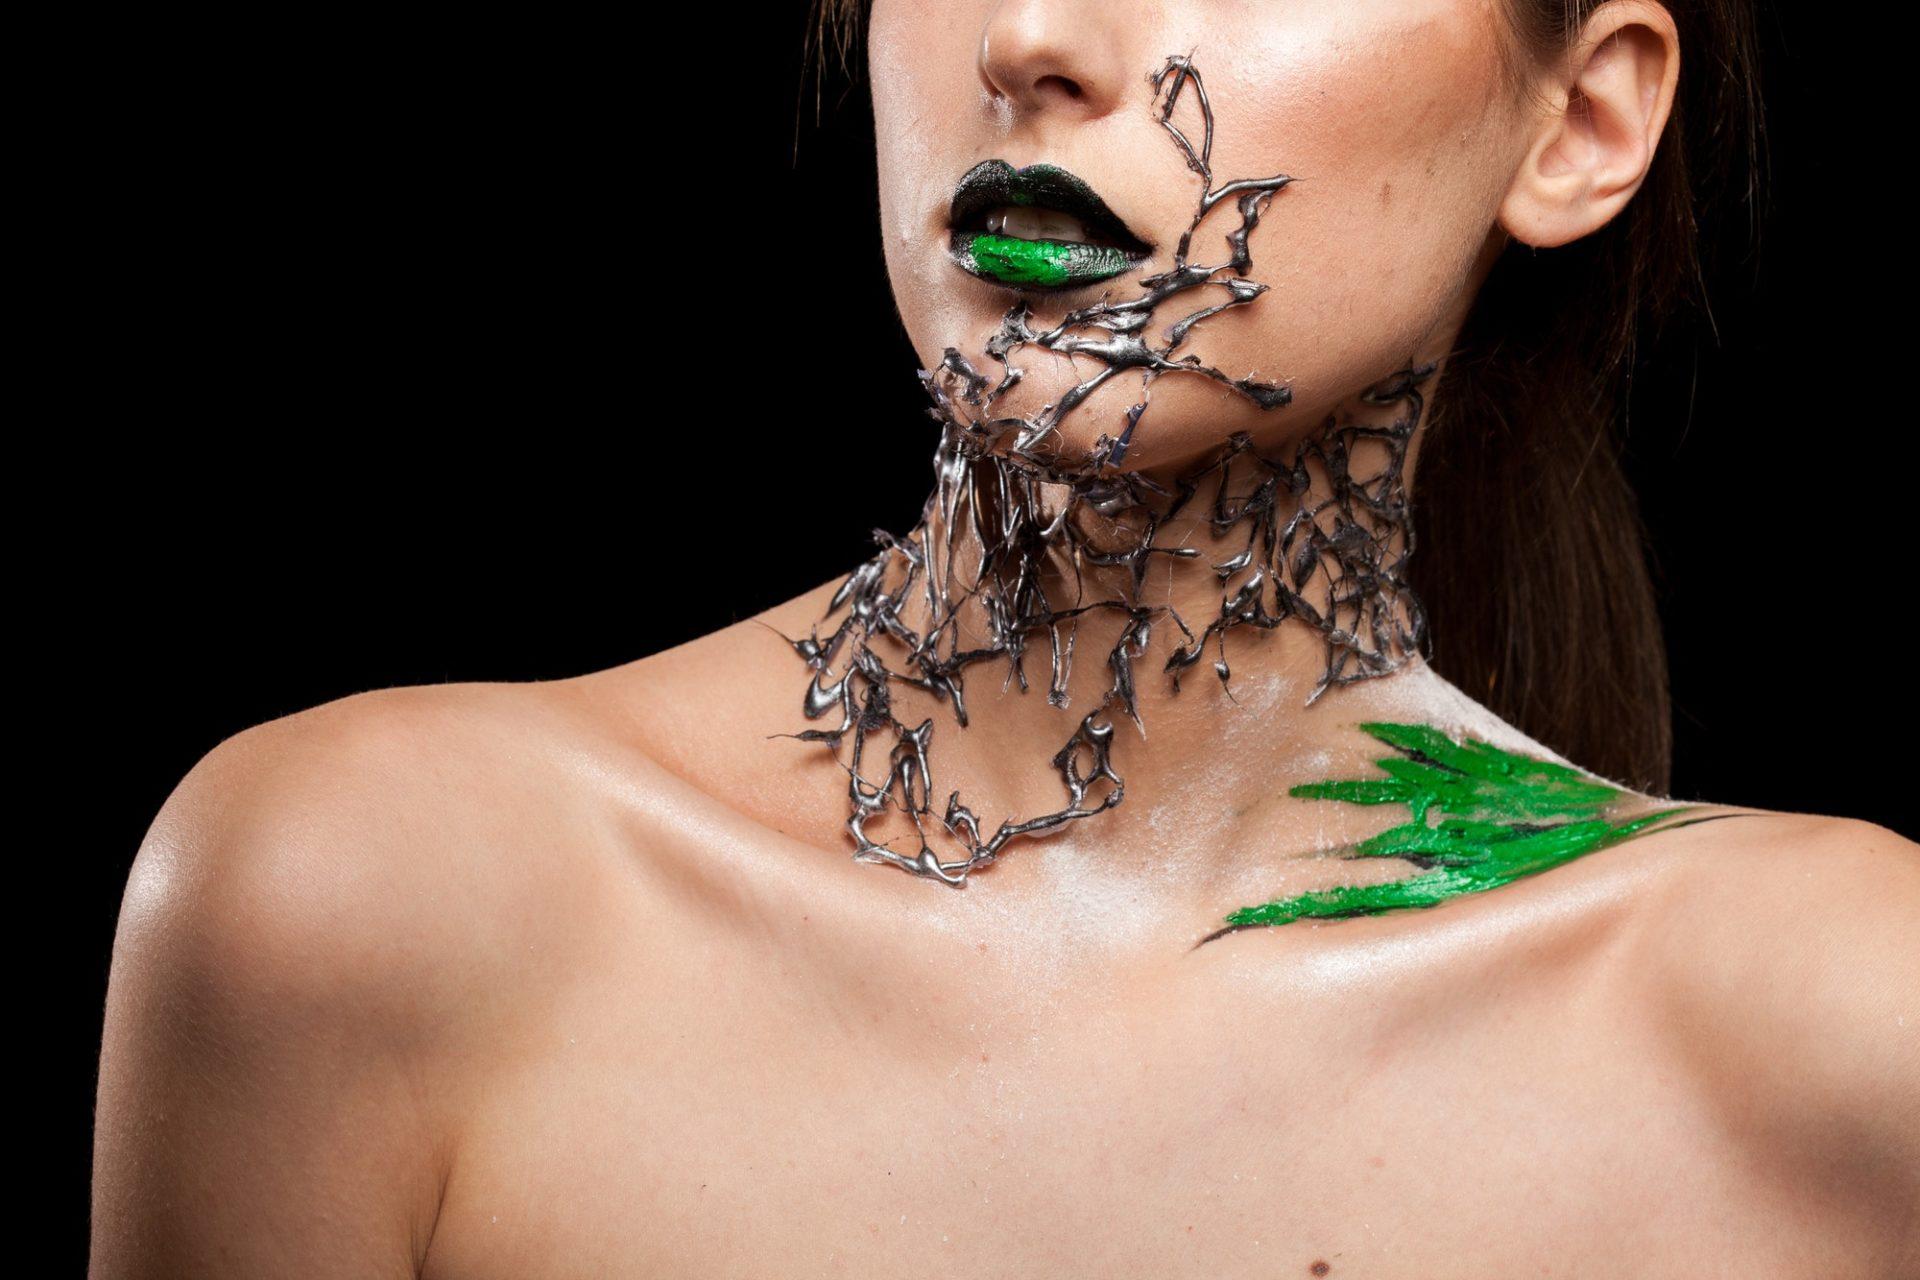 model-posing-in-studio-with-fashion-make-up.jpg